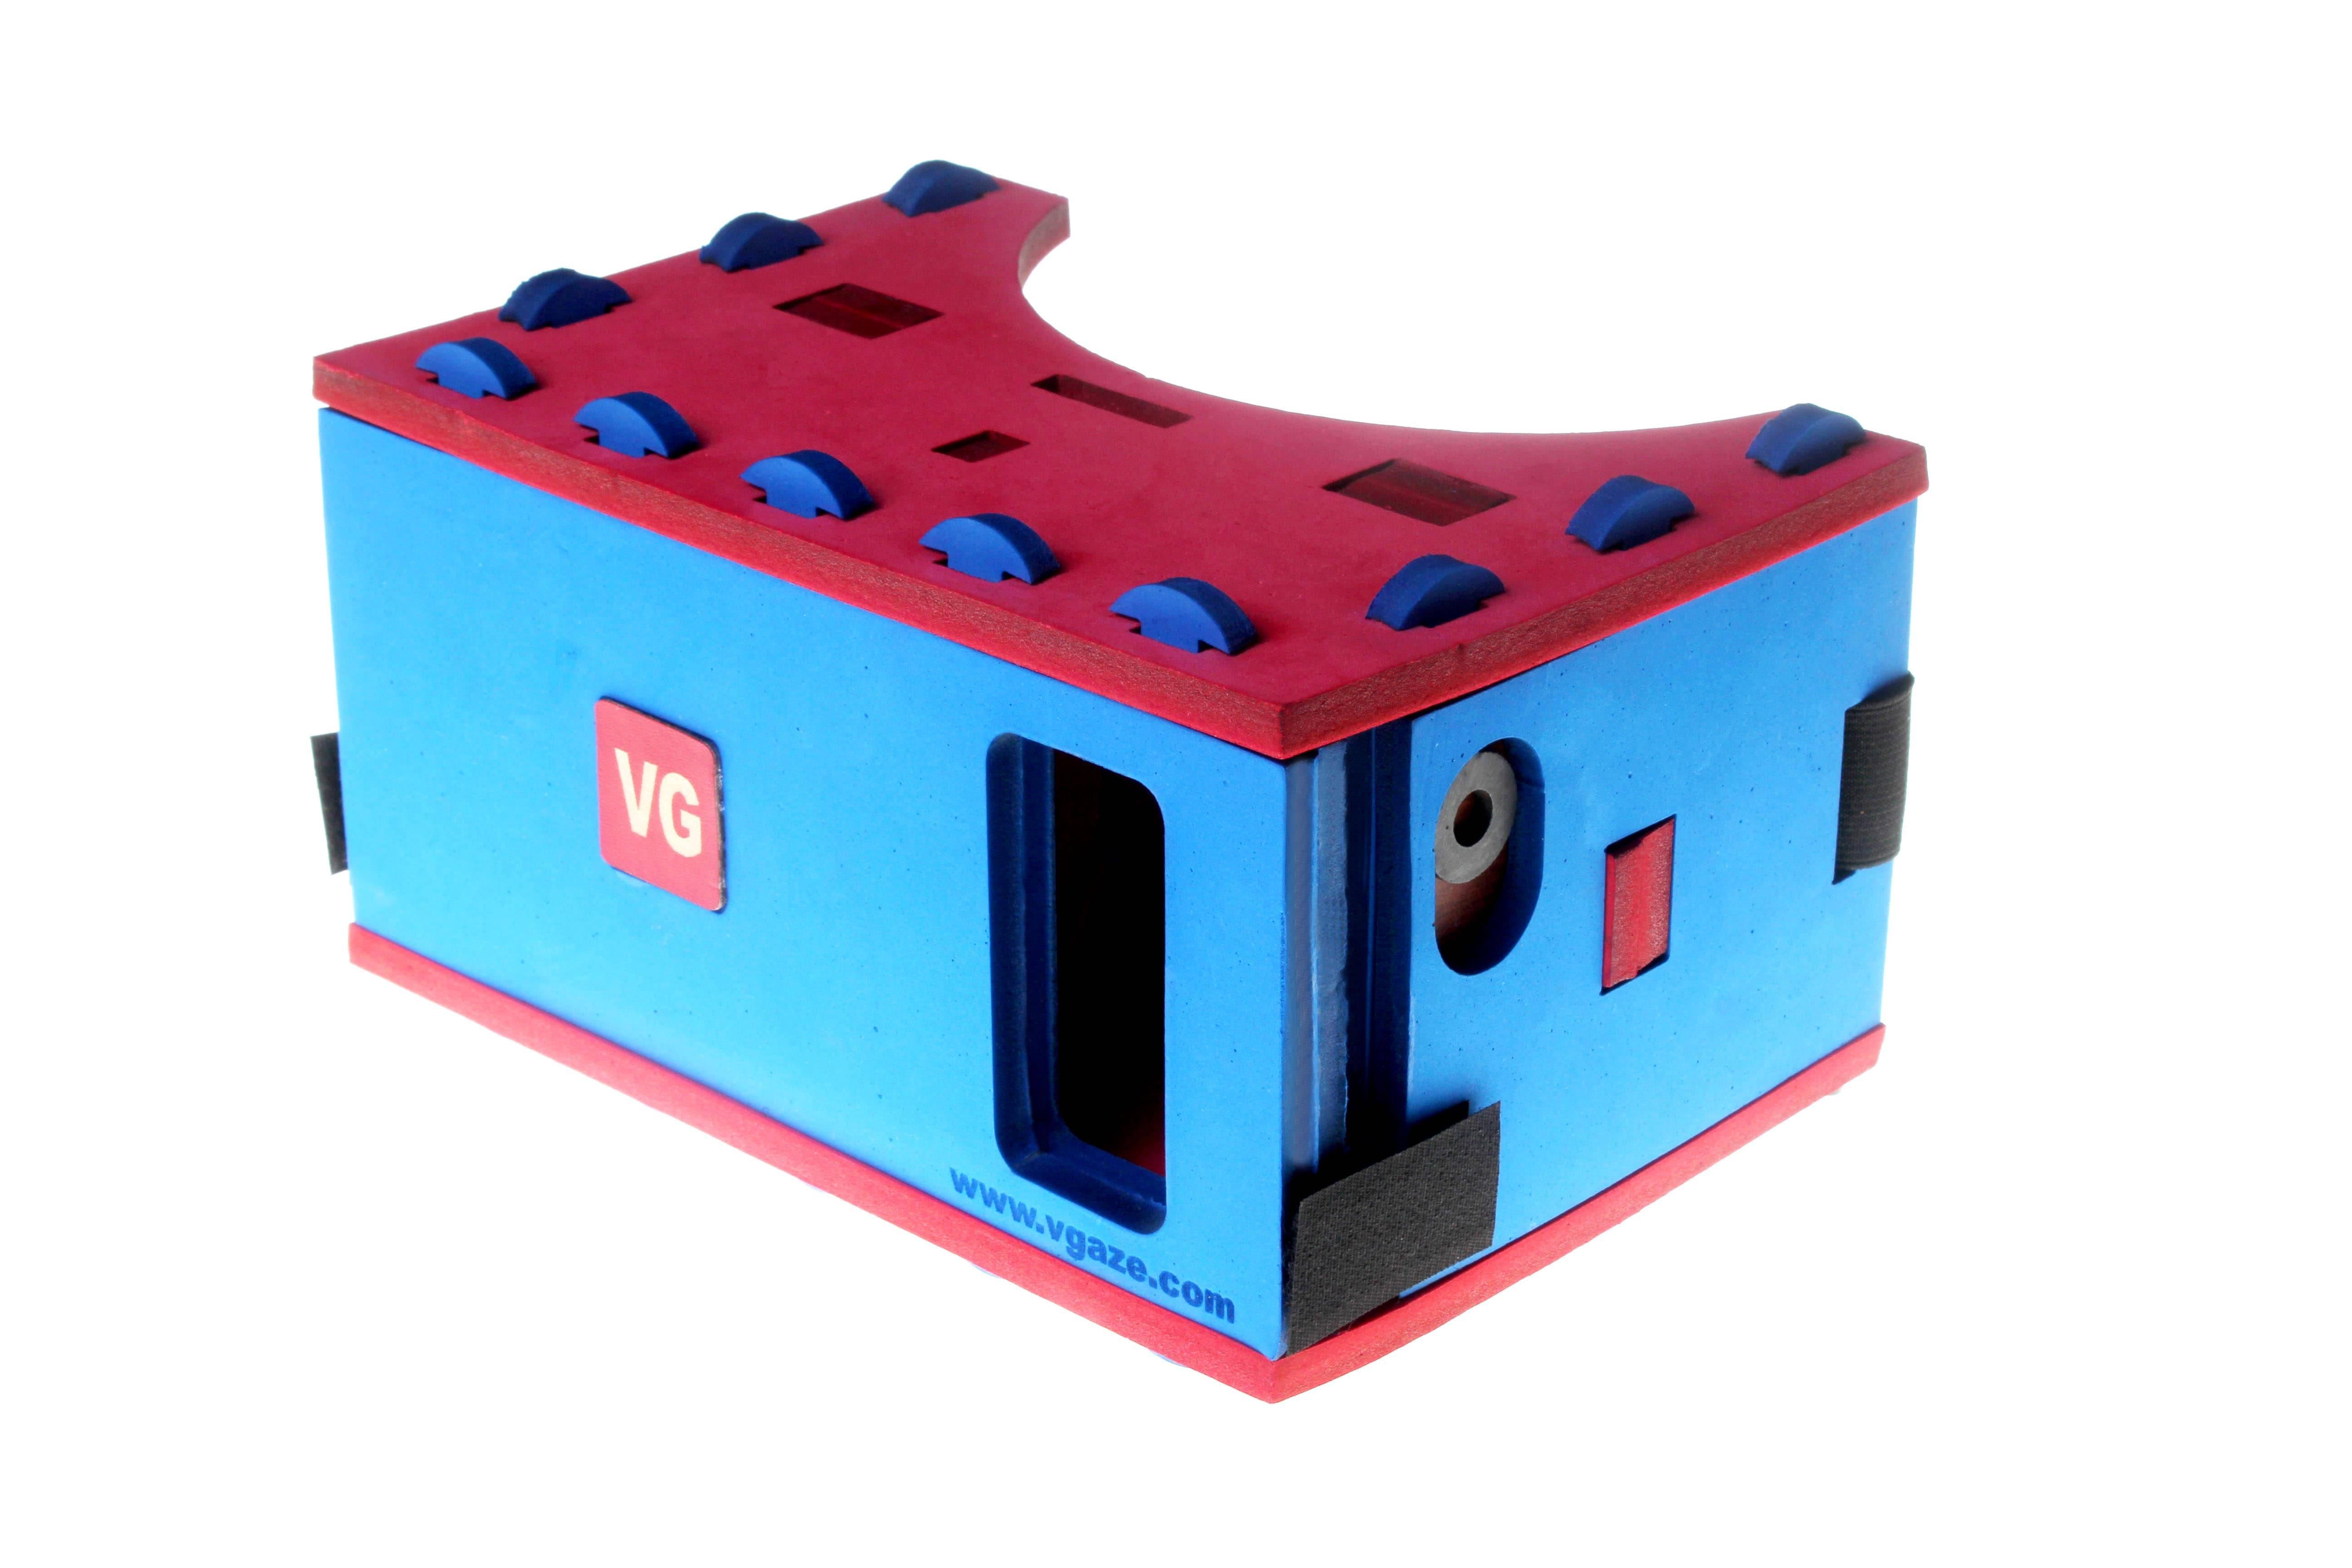 VG VR Foam Premium ( VR Headset )